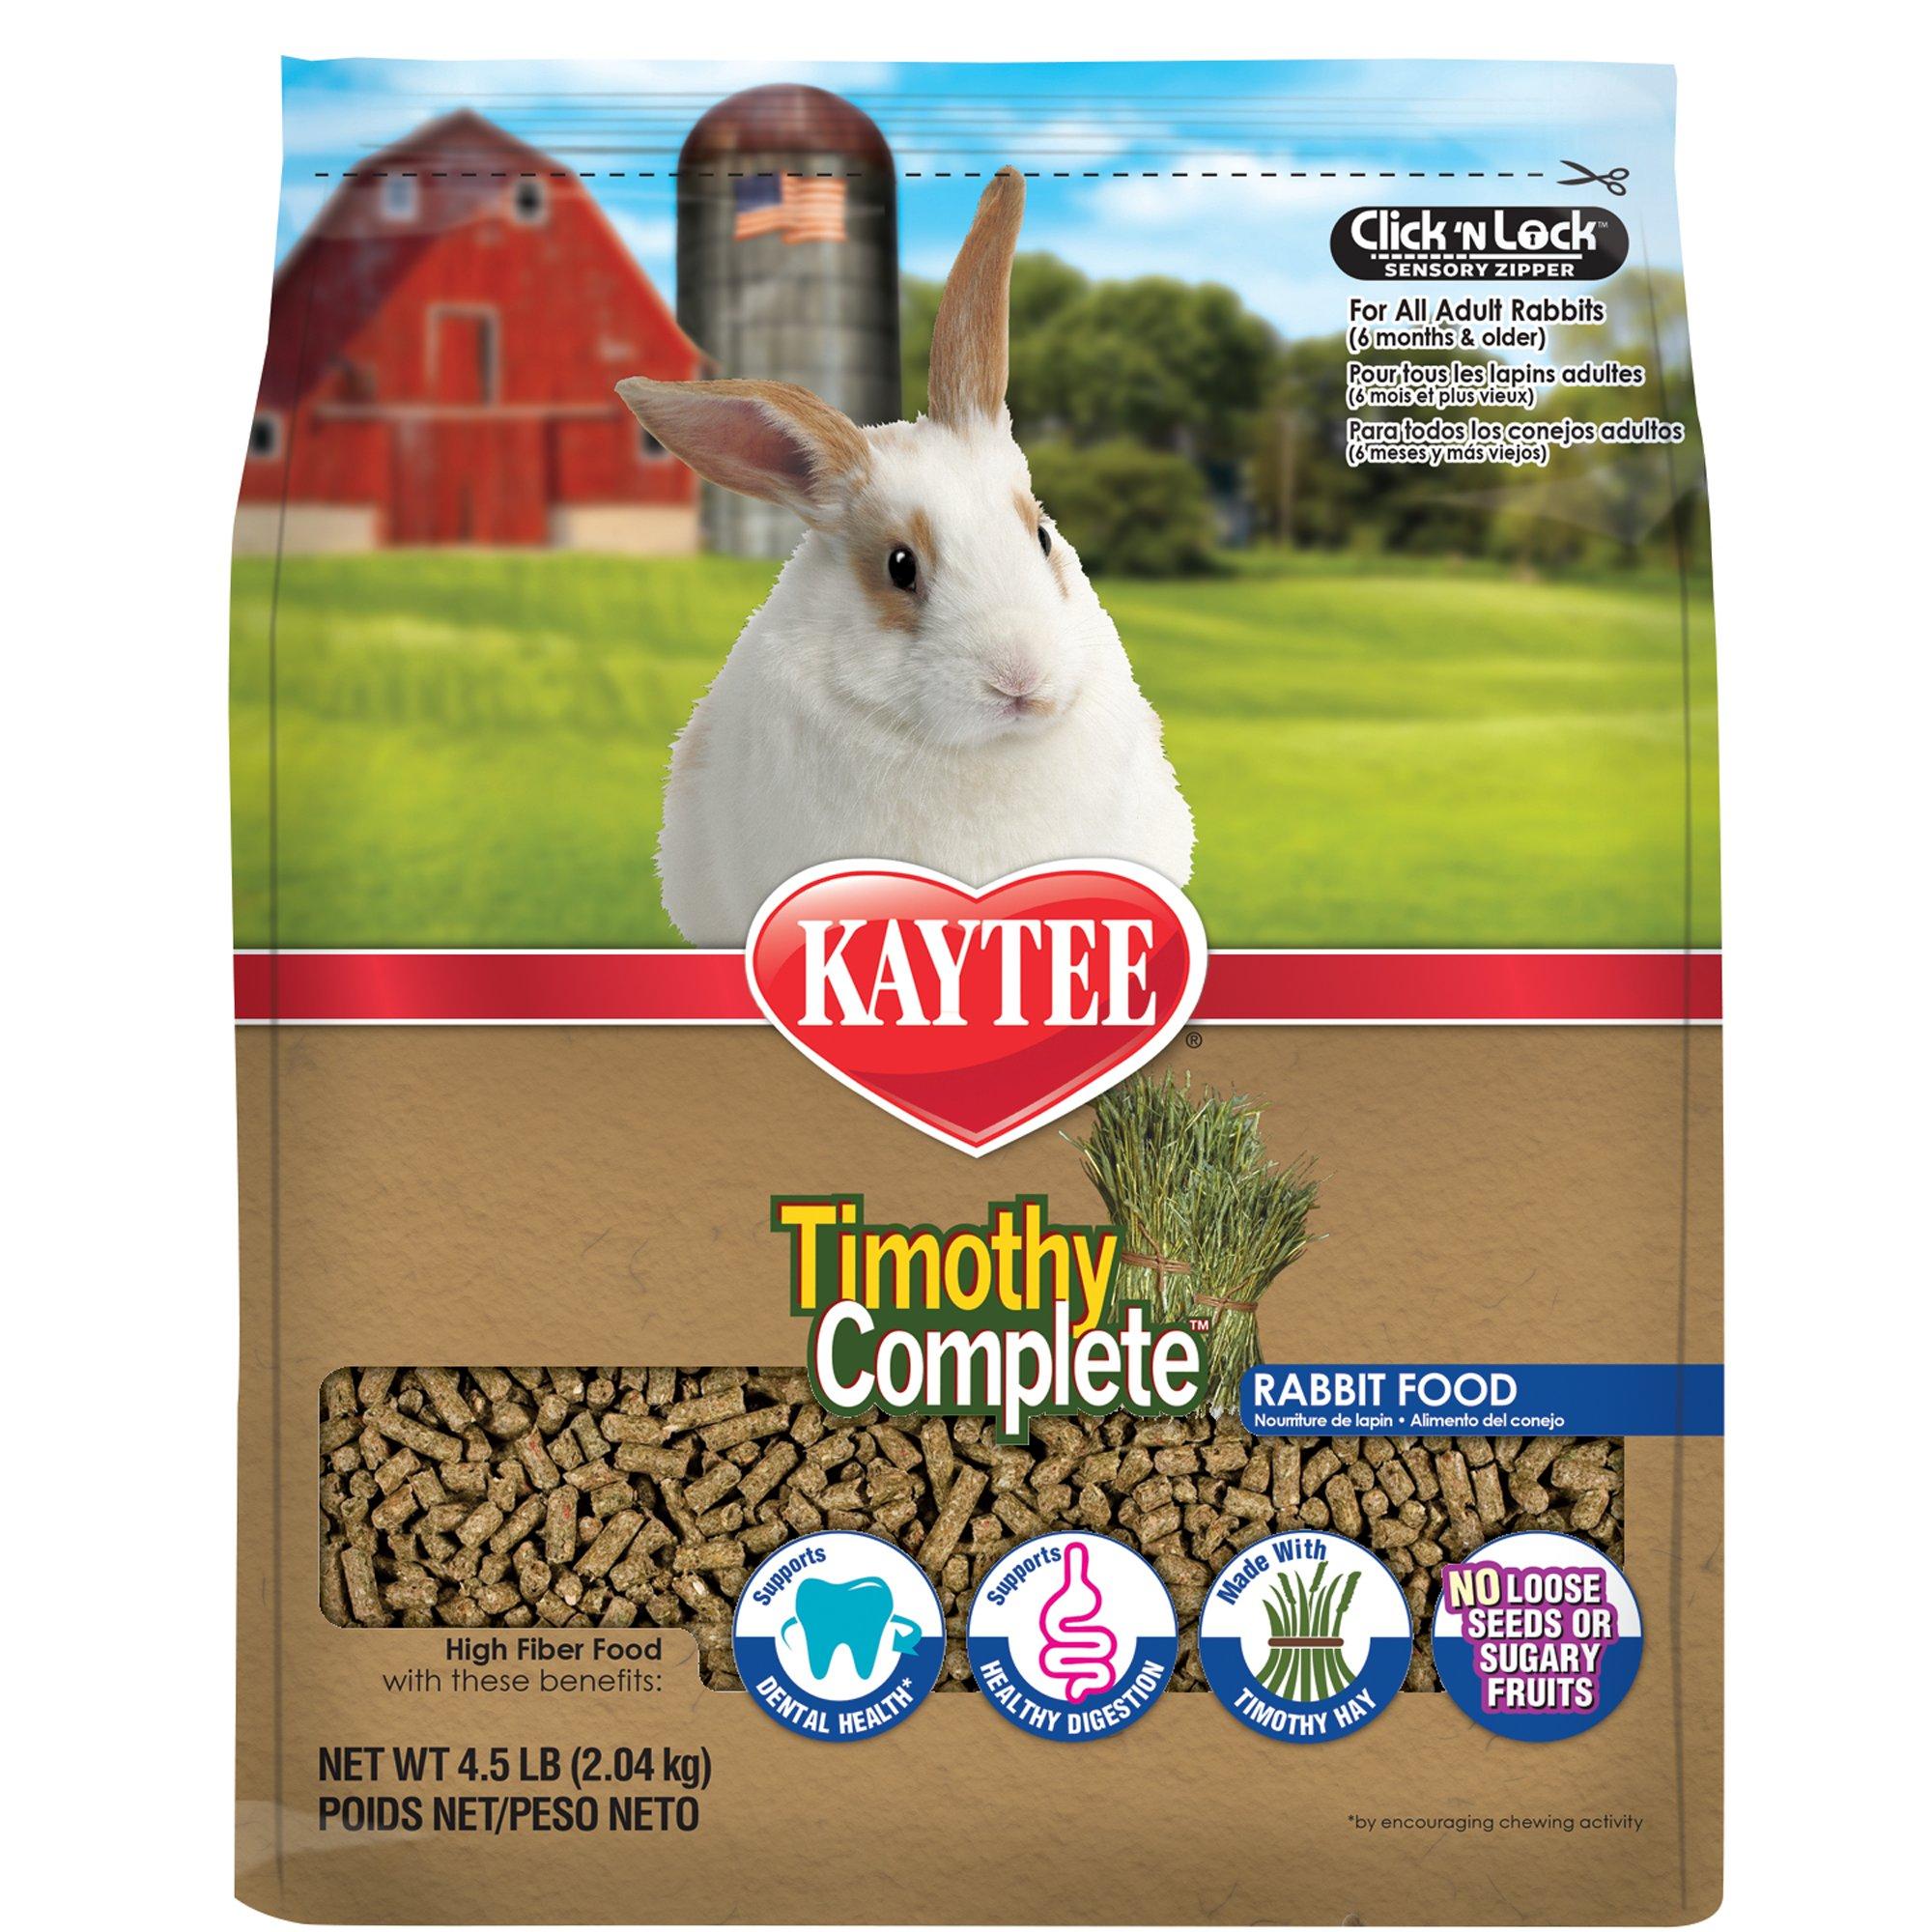 Kaytee Timothy Complete Rabbit Food Rabbit Food Fiber Diet